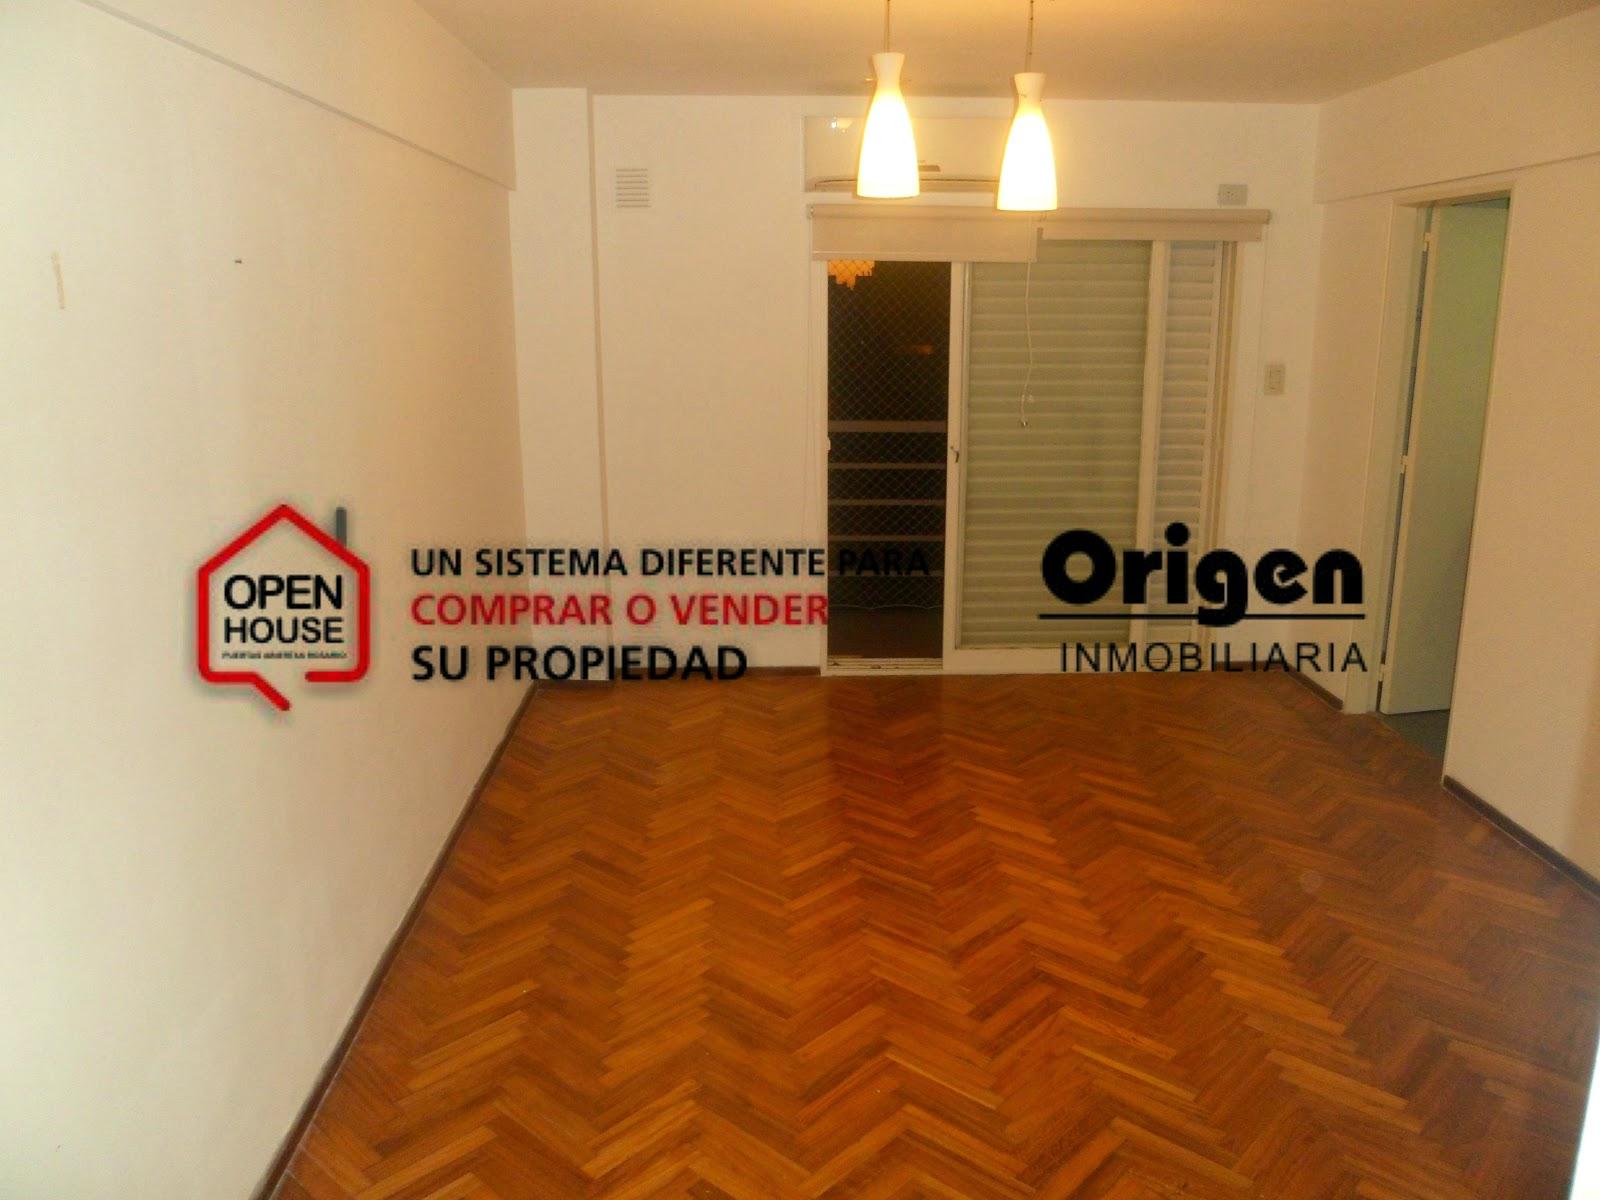 Origen inmobiliaria abril 2014 - Inmobiliaria origen ...